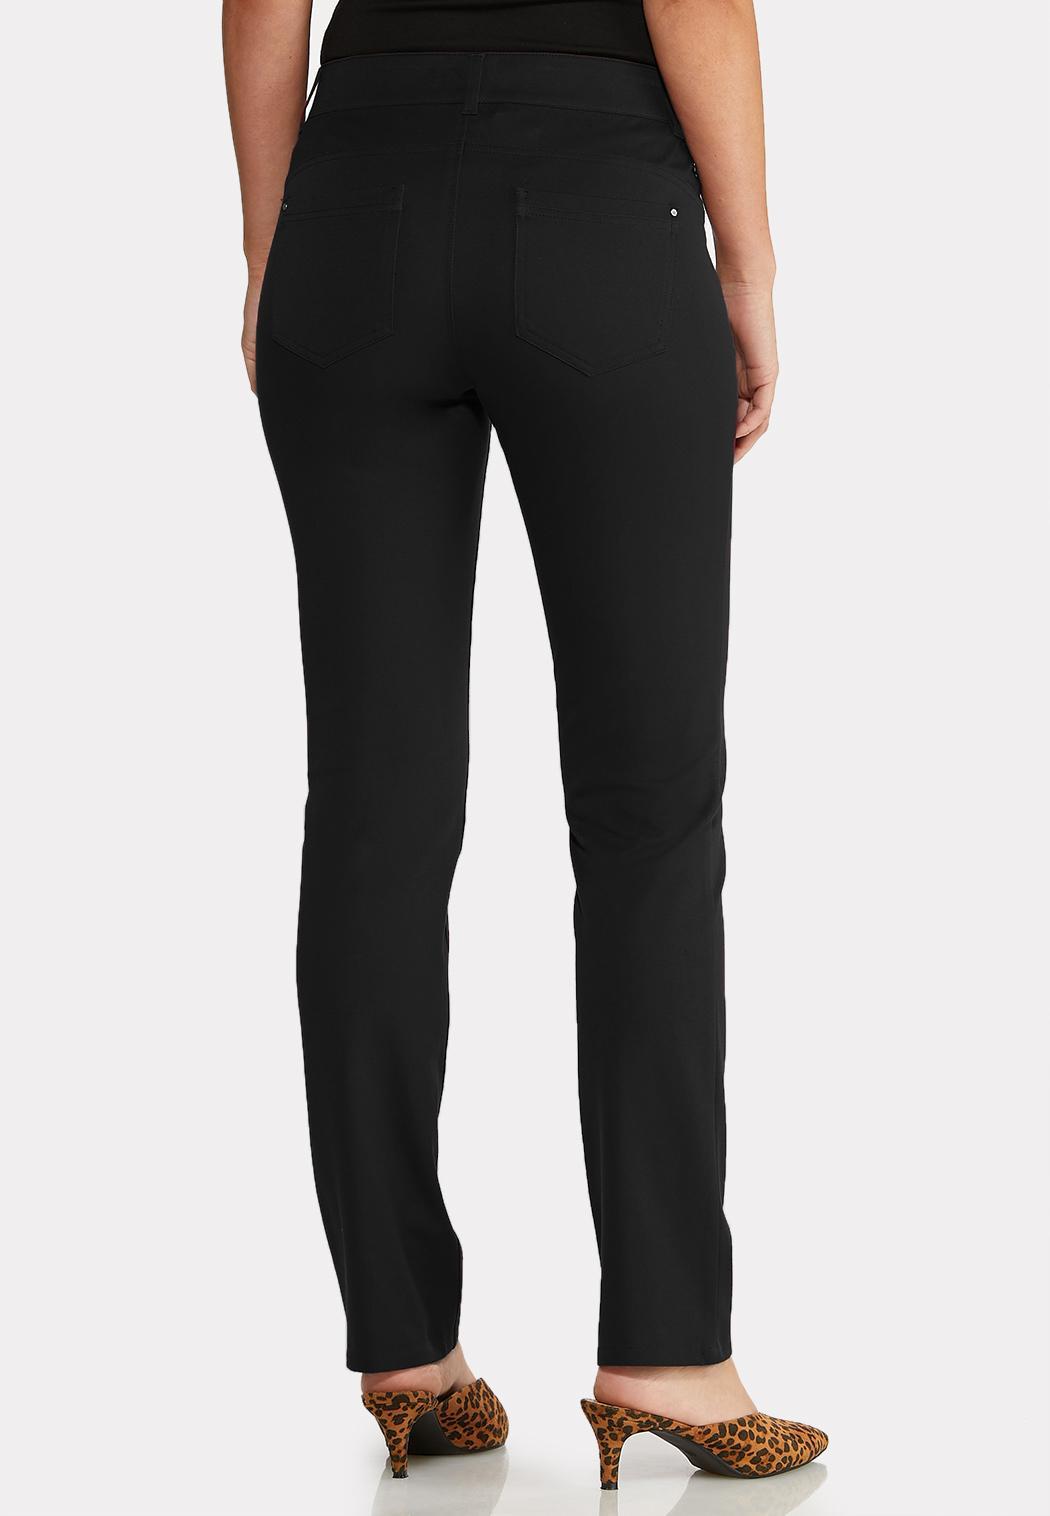 Petite Everywhere Pants (Item #43955432)